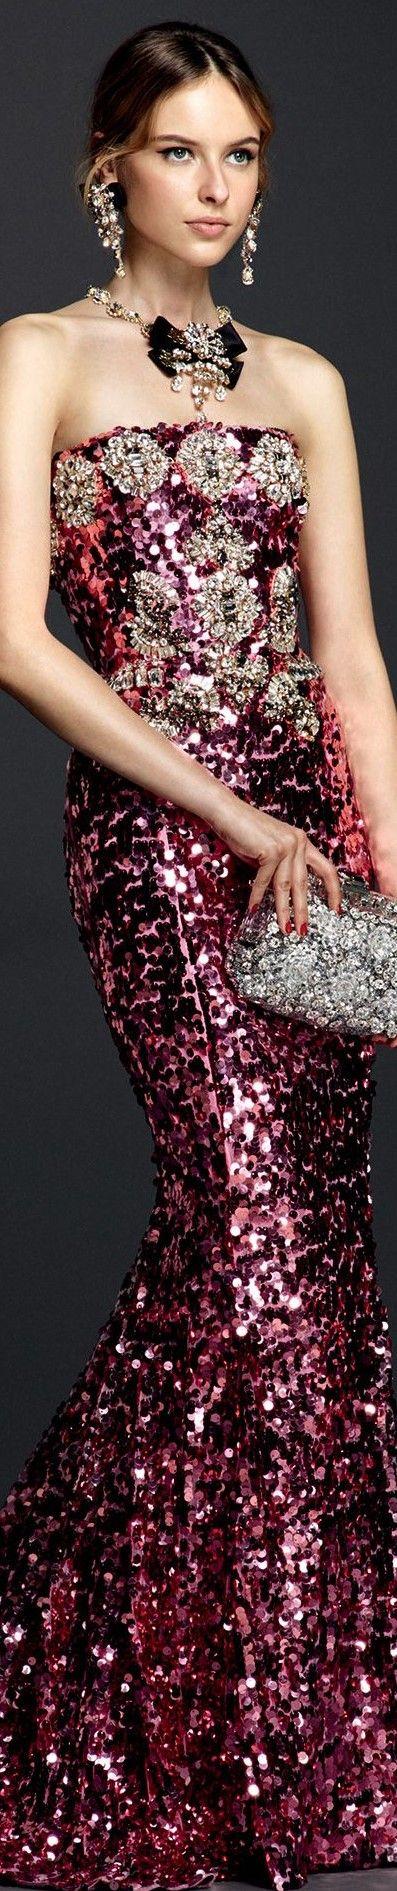 Dolce & Gabbana Fashion Pinned By Whirlypath | Fashion ...